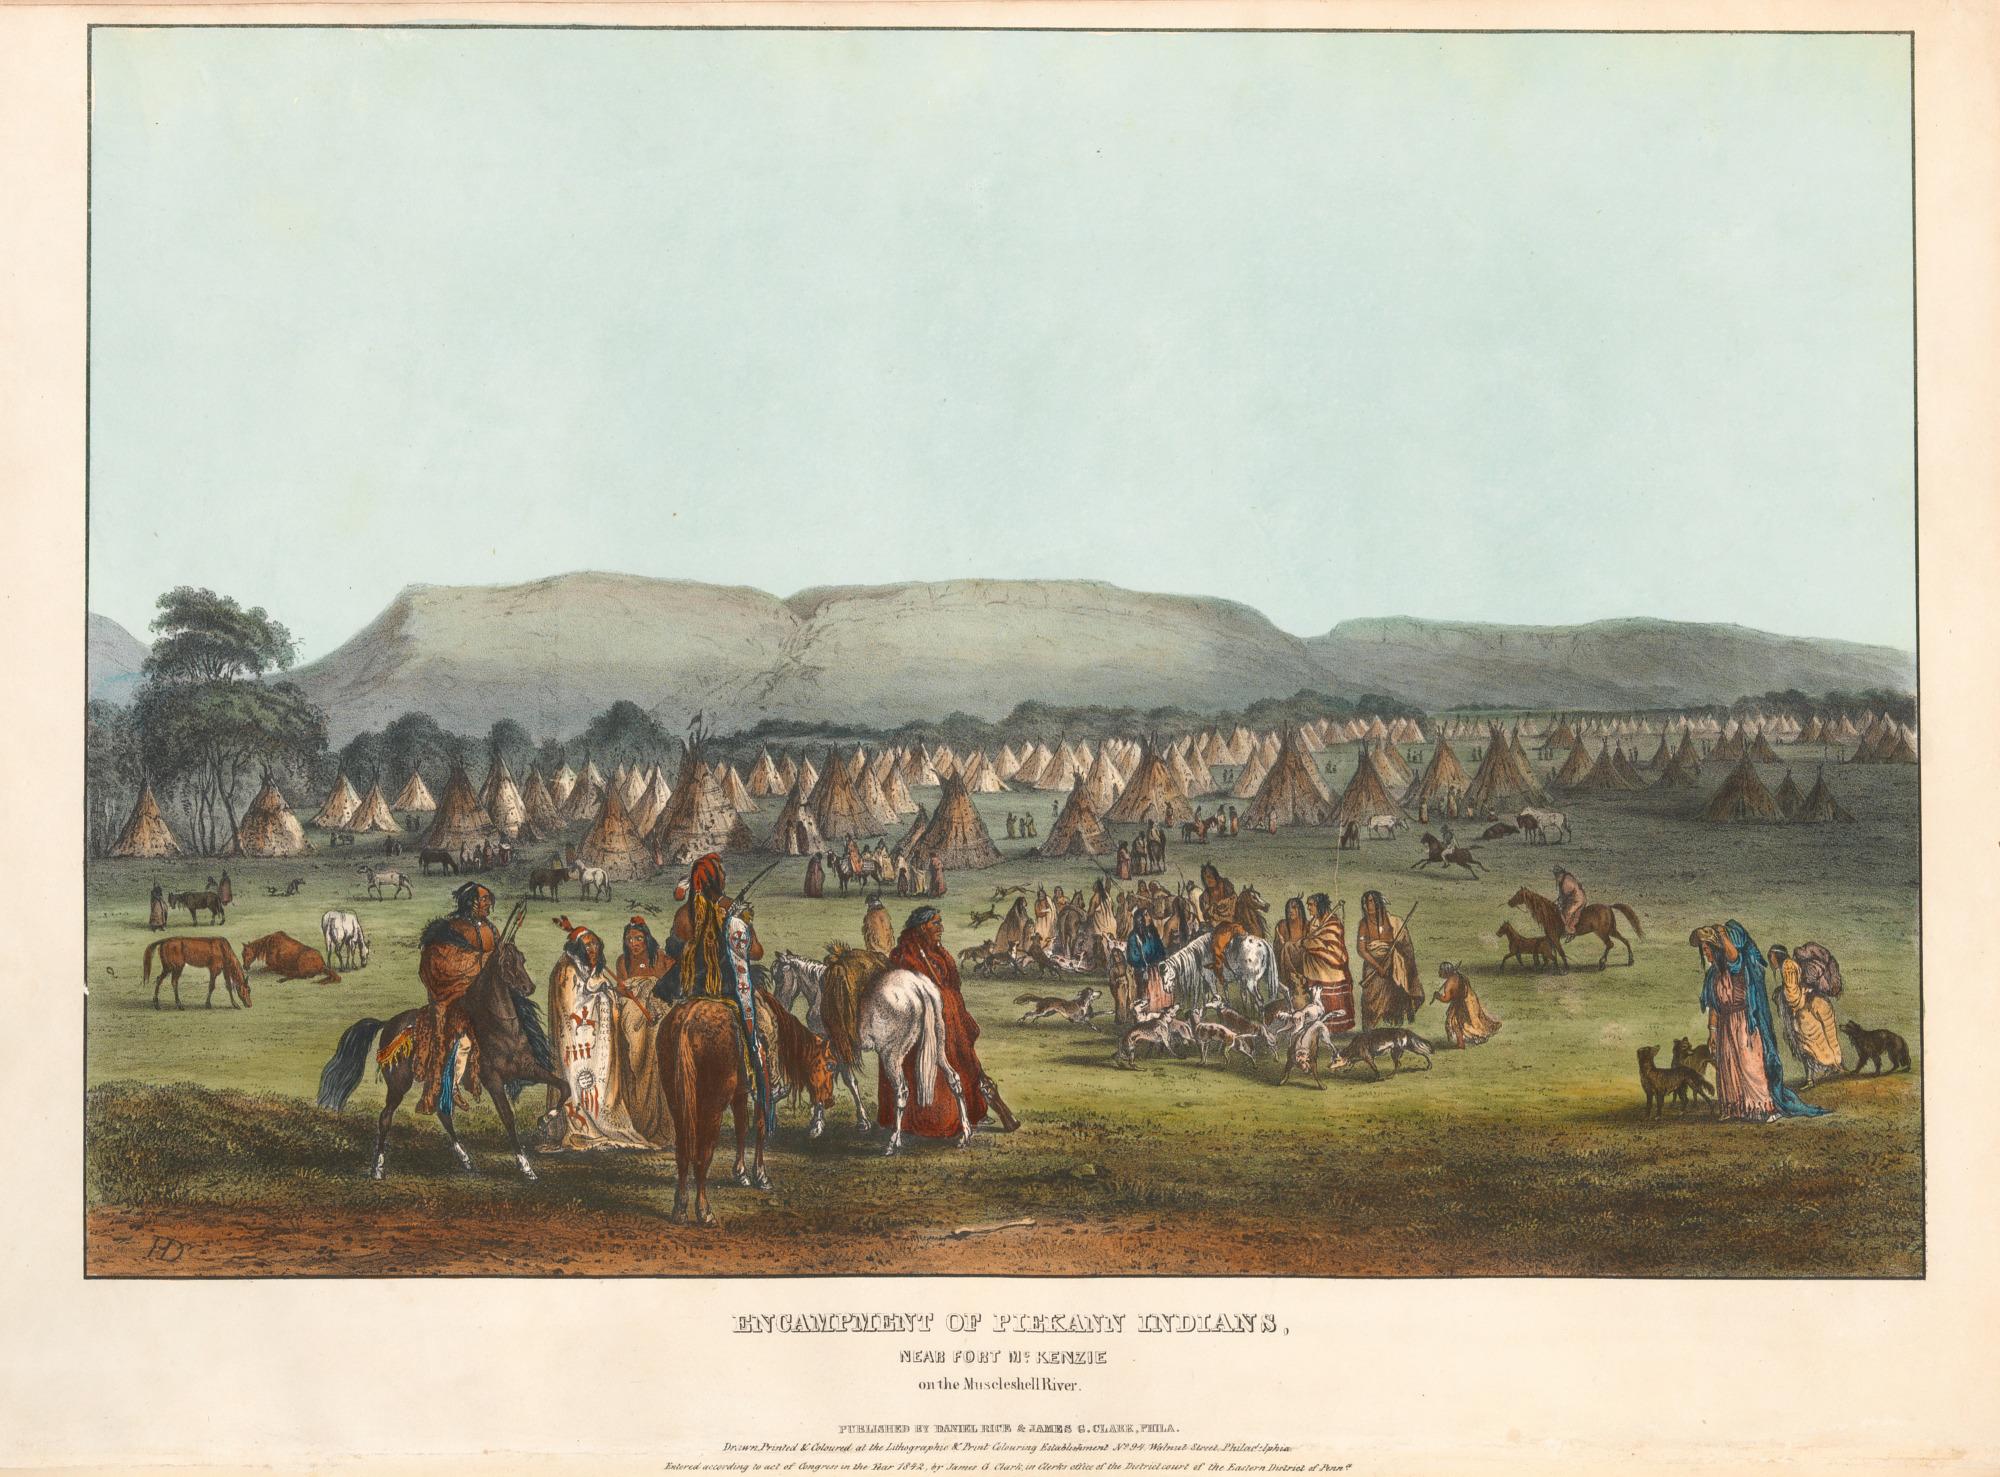 Encampment of Piekann Indians